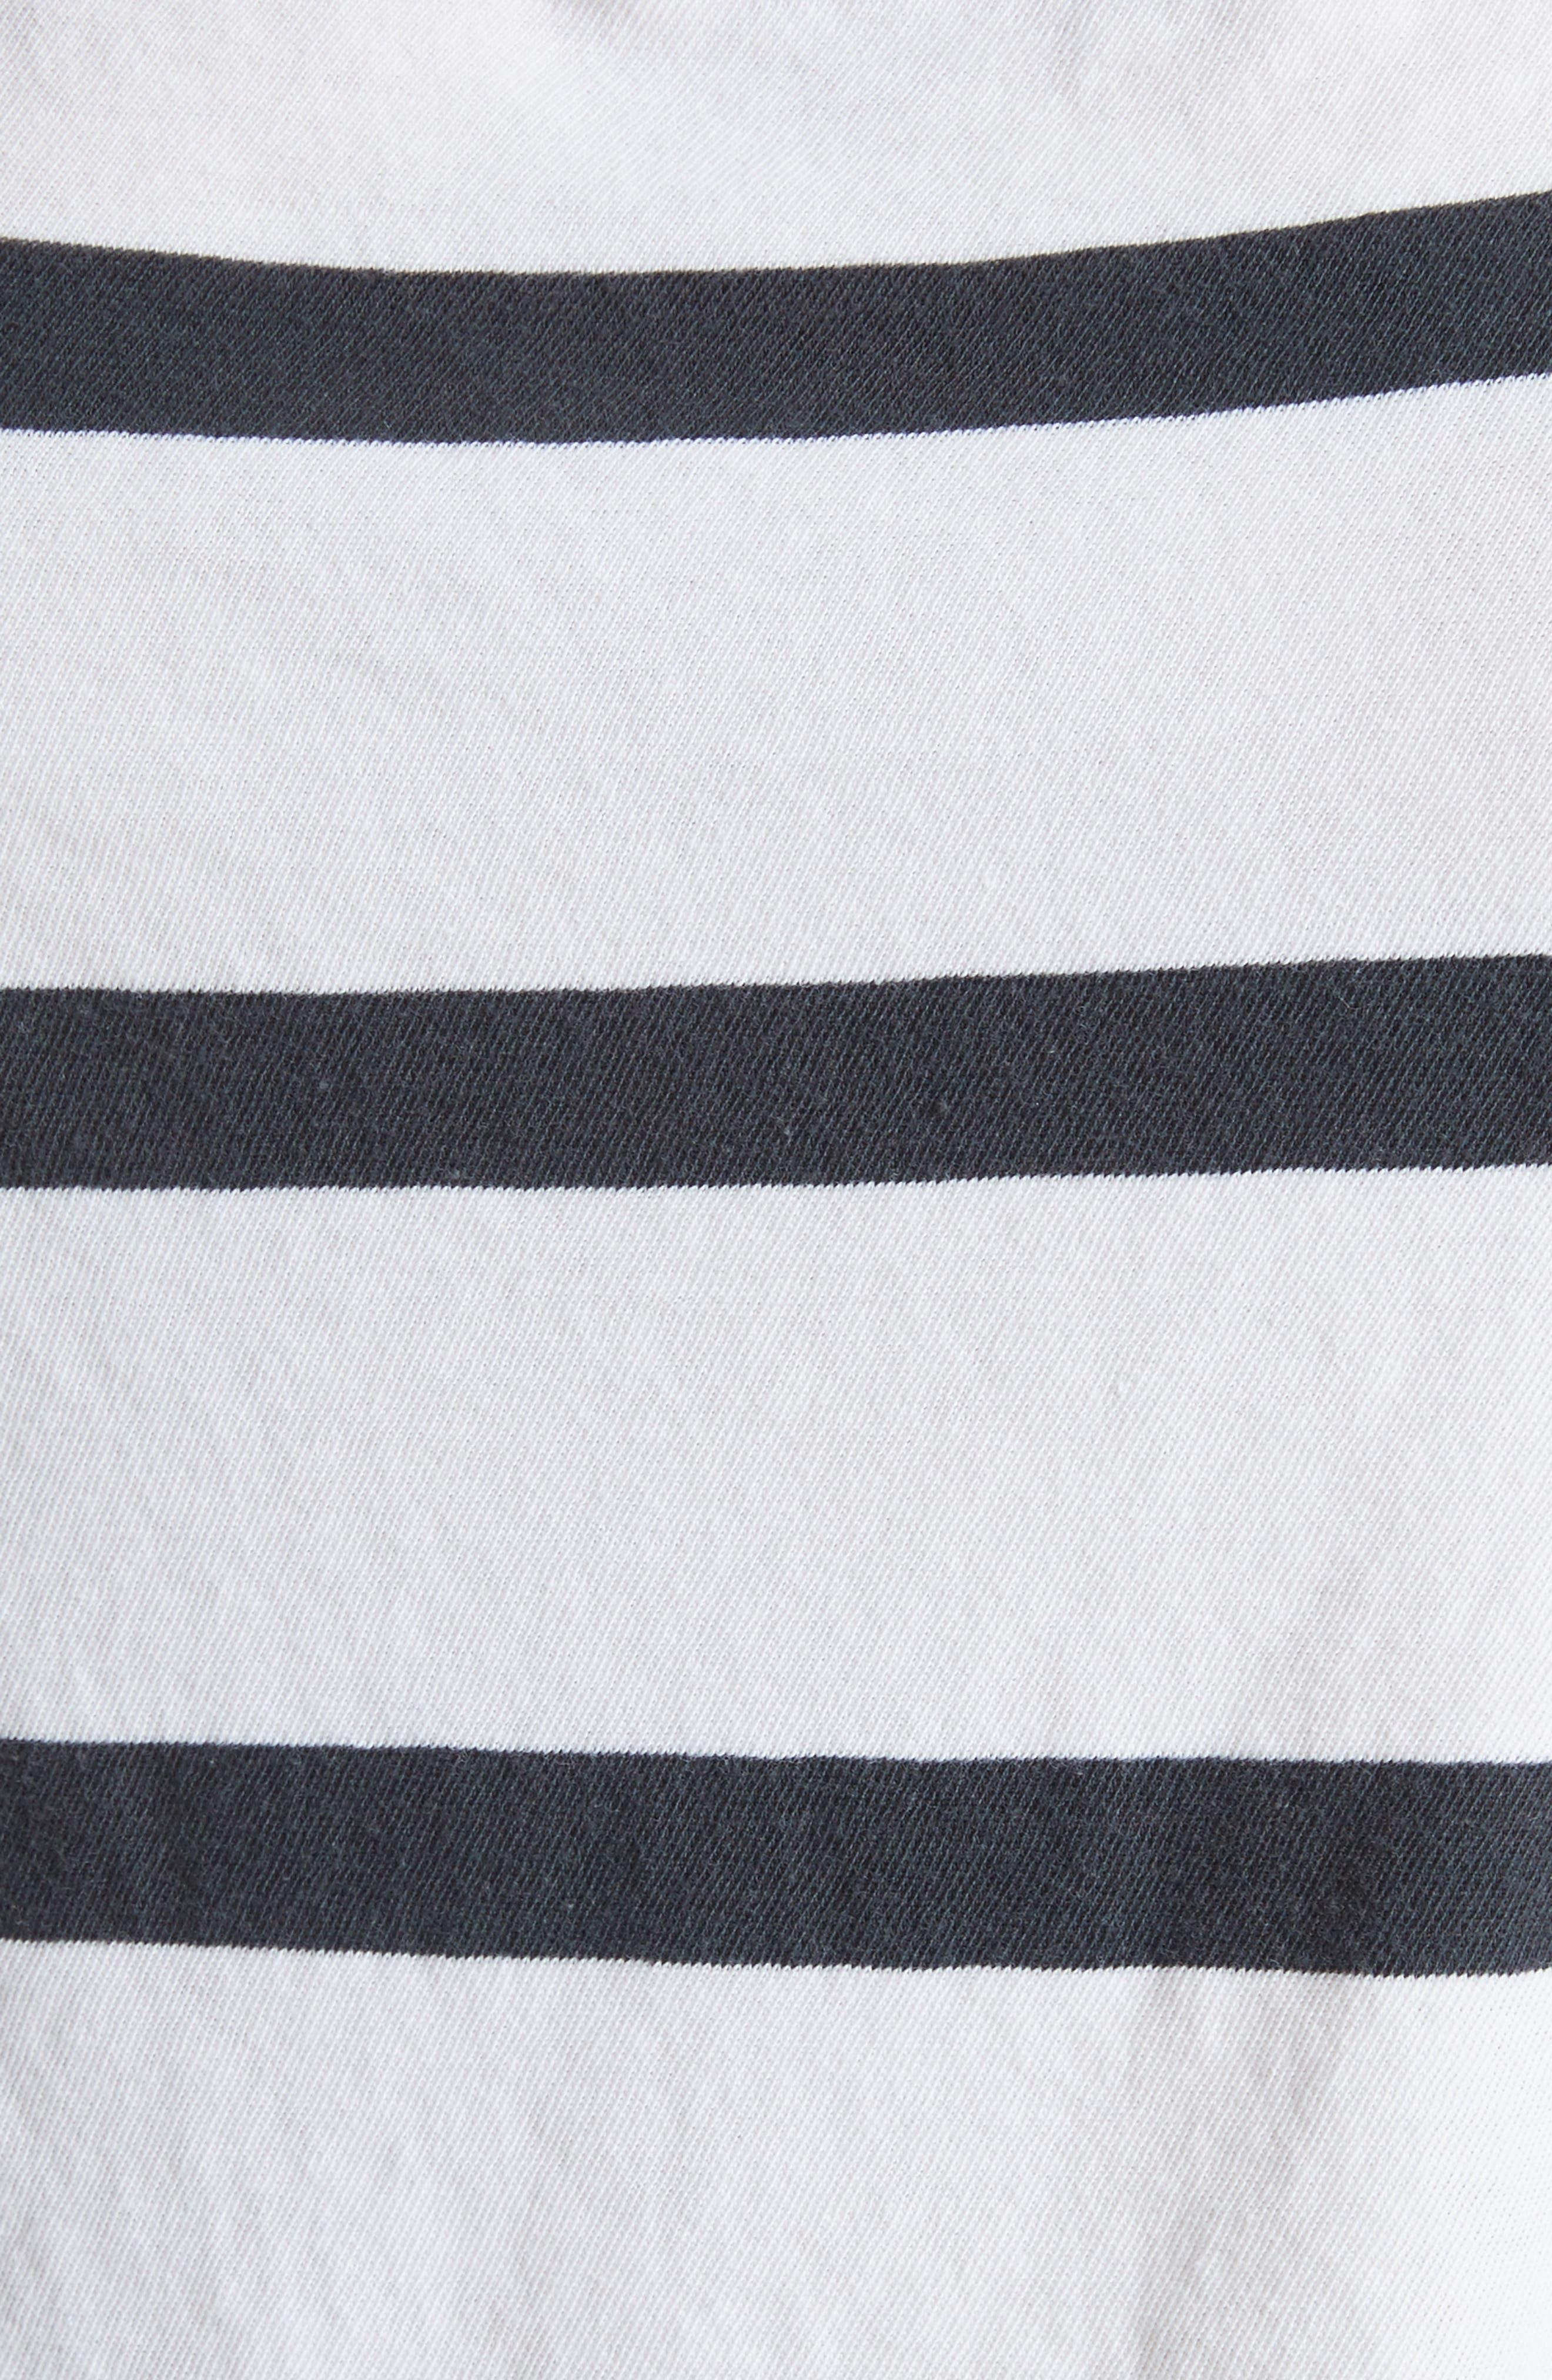 Stripe Cut Neck Tee,                             Alternate thumbnail 5, color,                             Bleach Stripe